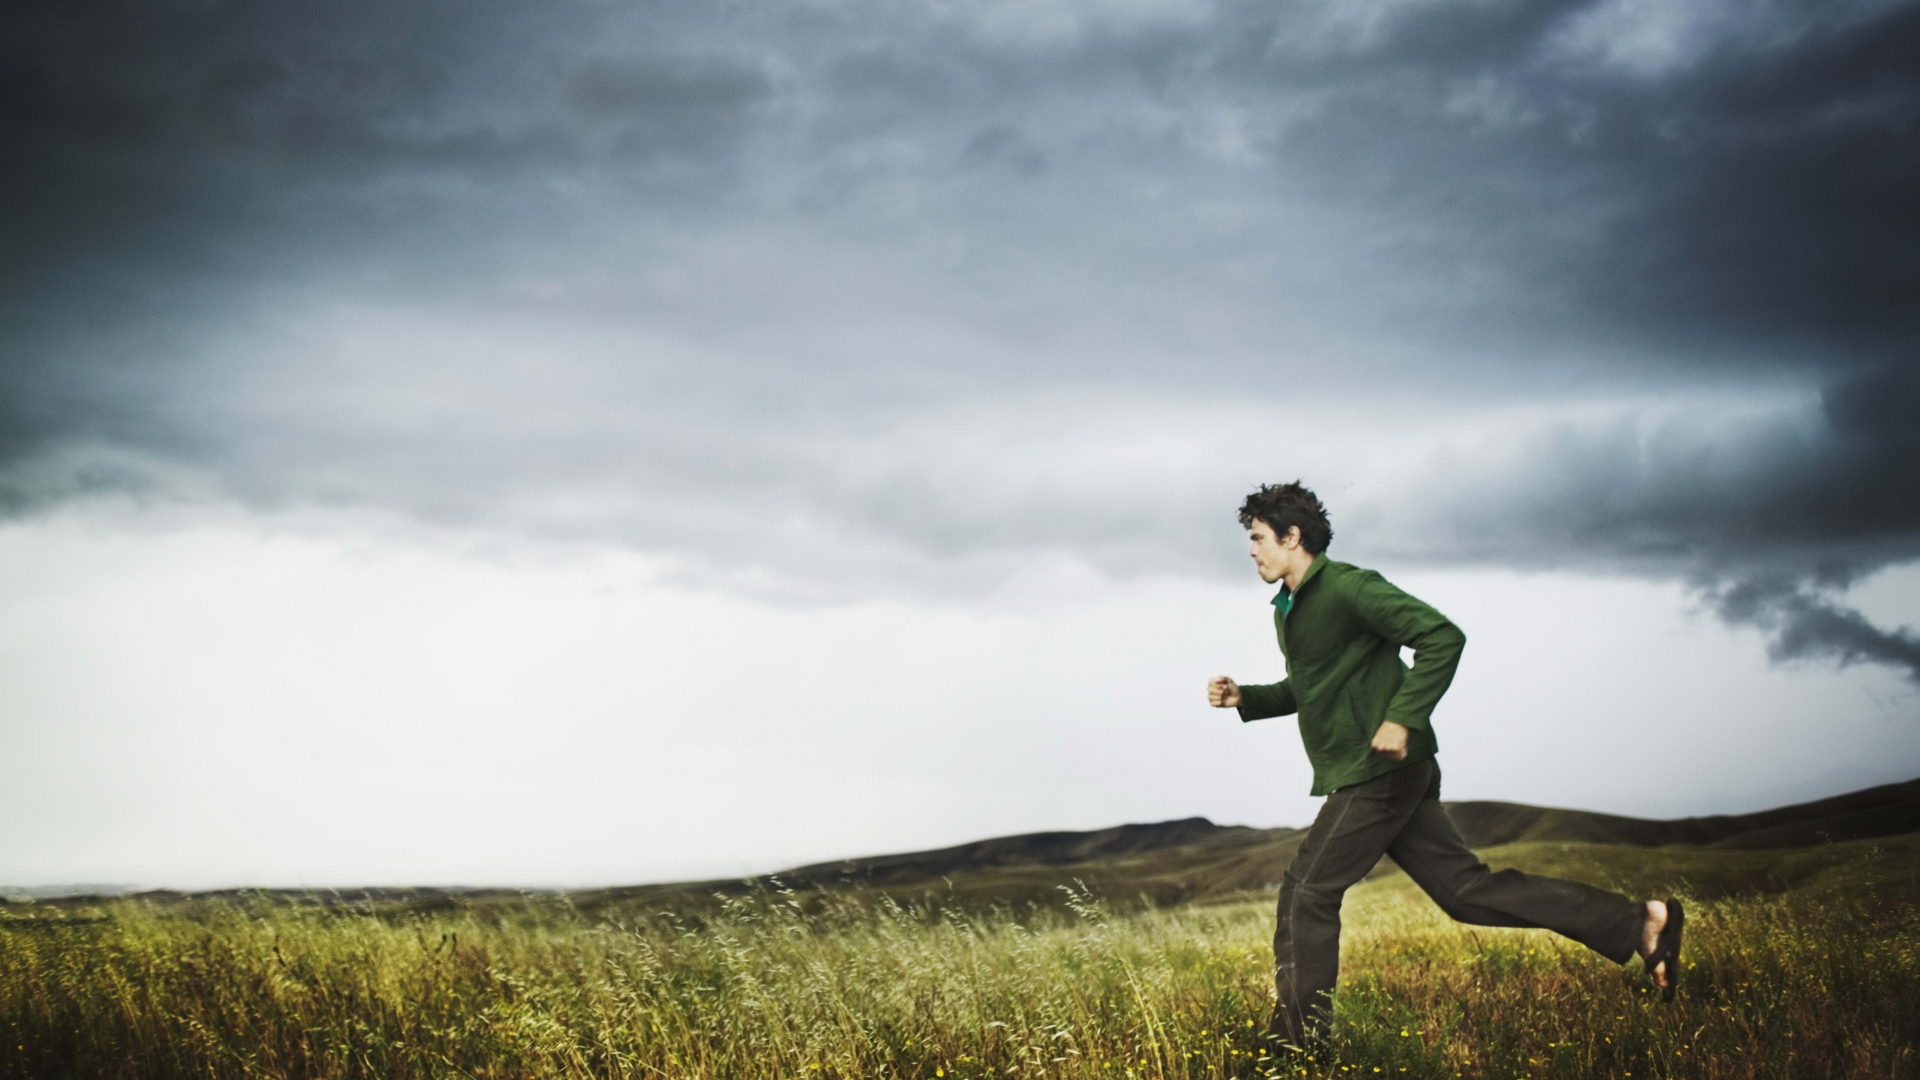 Download Wallpaper 1920x1080 Field, Sports, Running, Storm